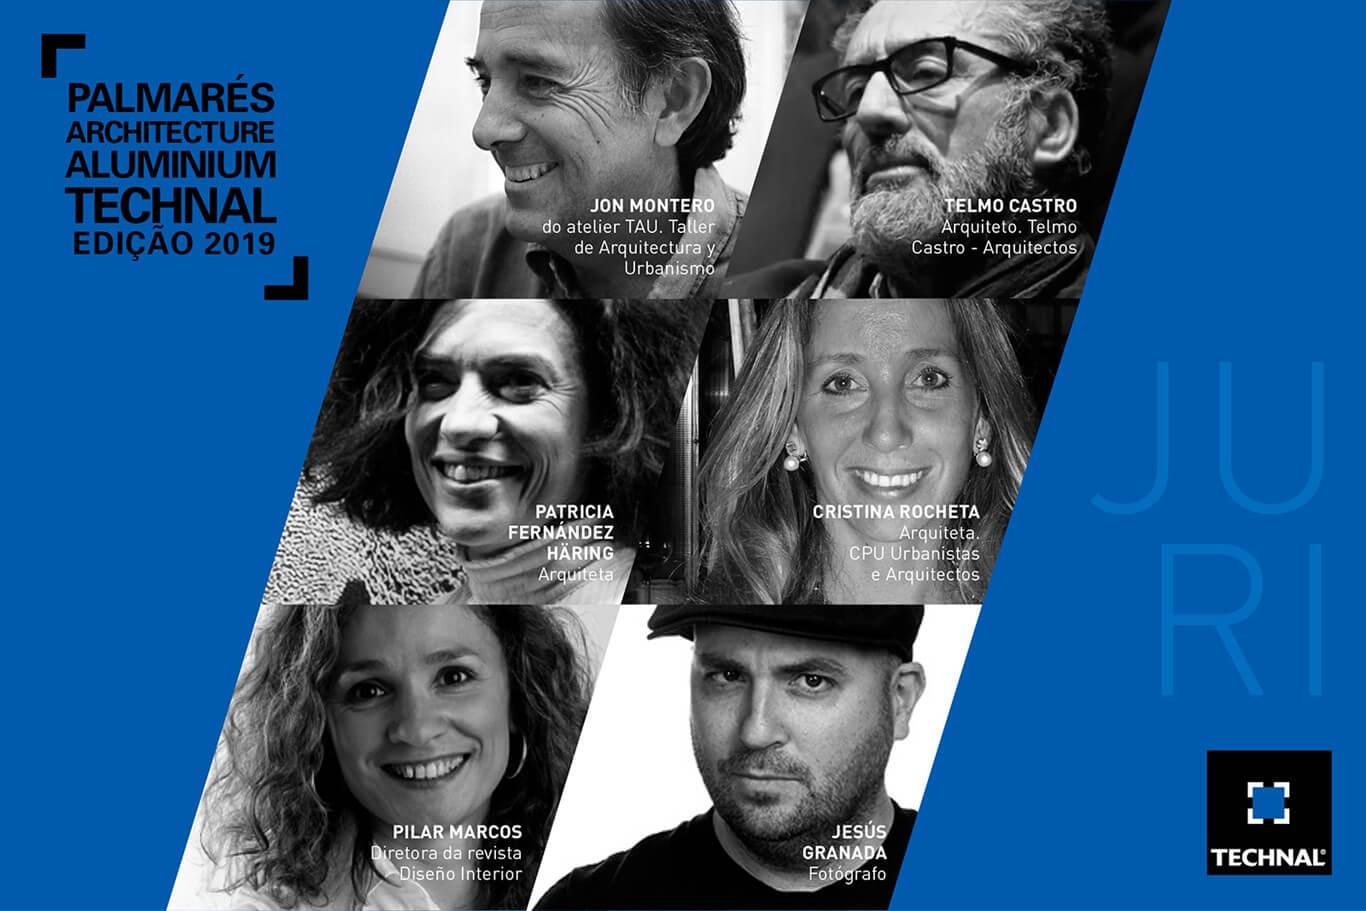 Palmarés Architecture Aluminium Technal já tem júri para a edição de 2019